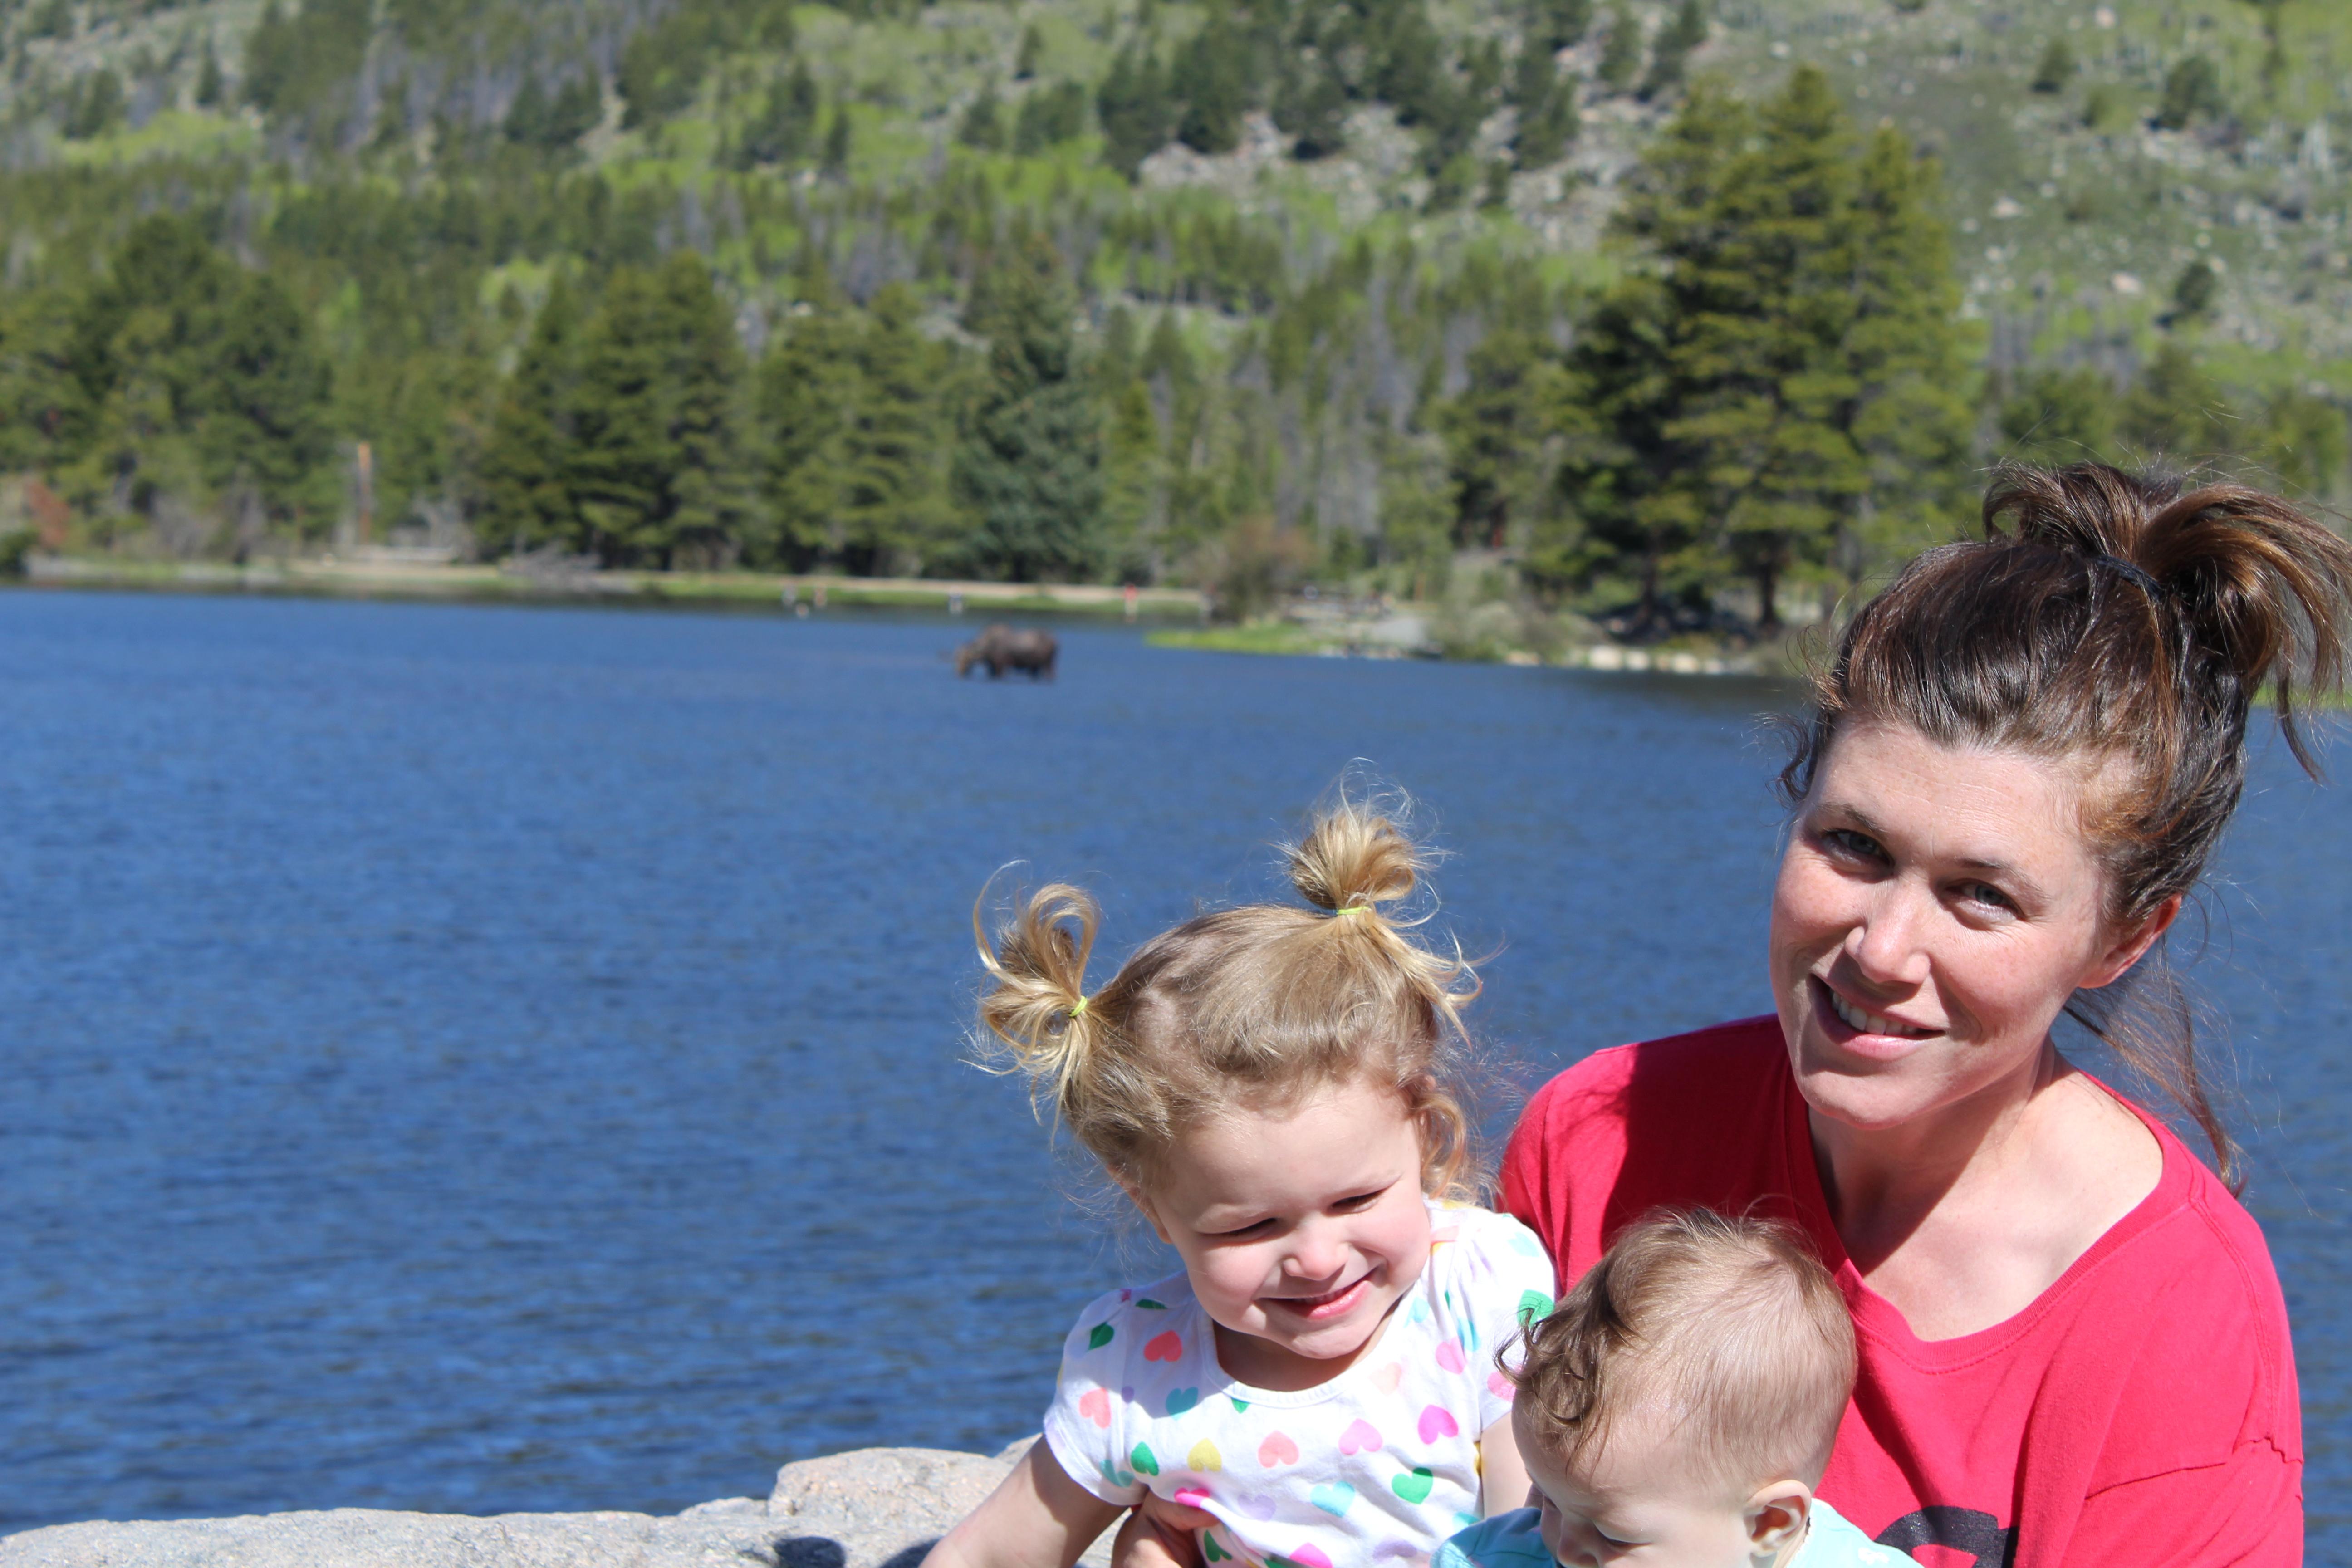 family photos at sprague lake in rocky mountain national park